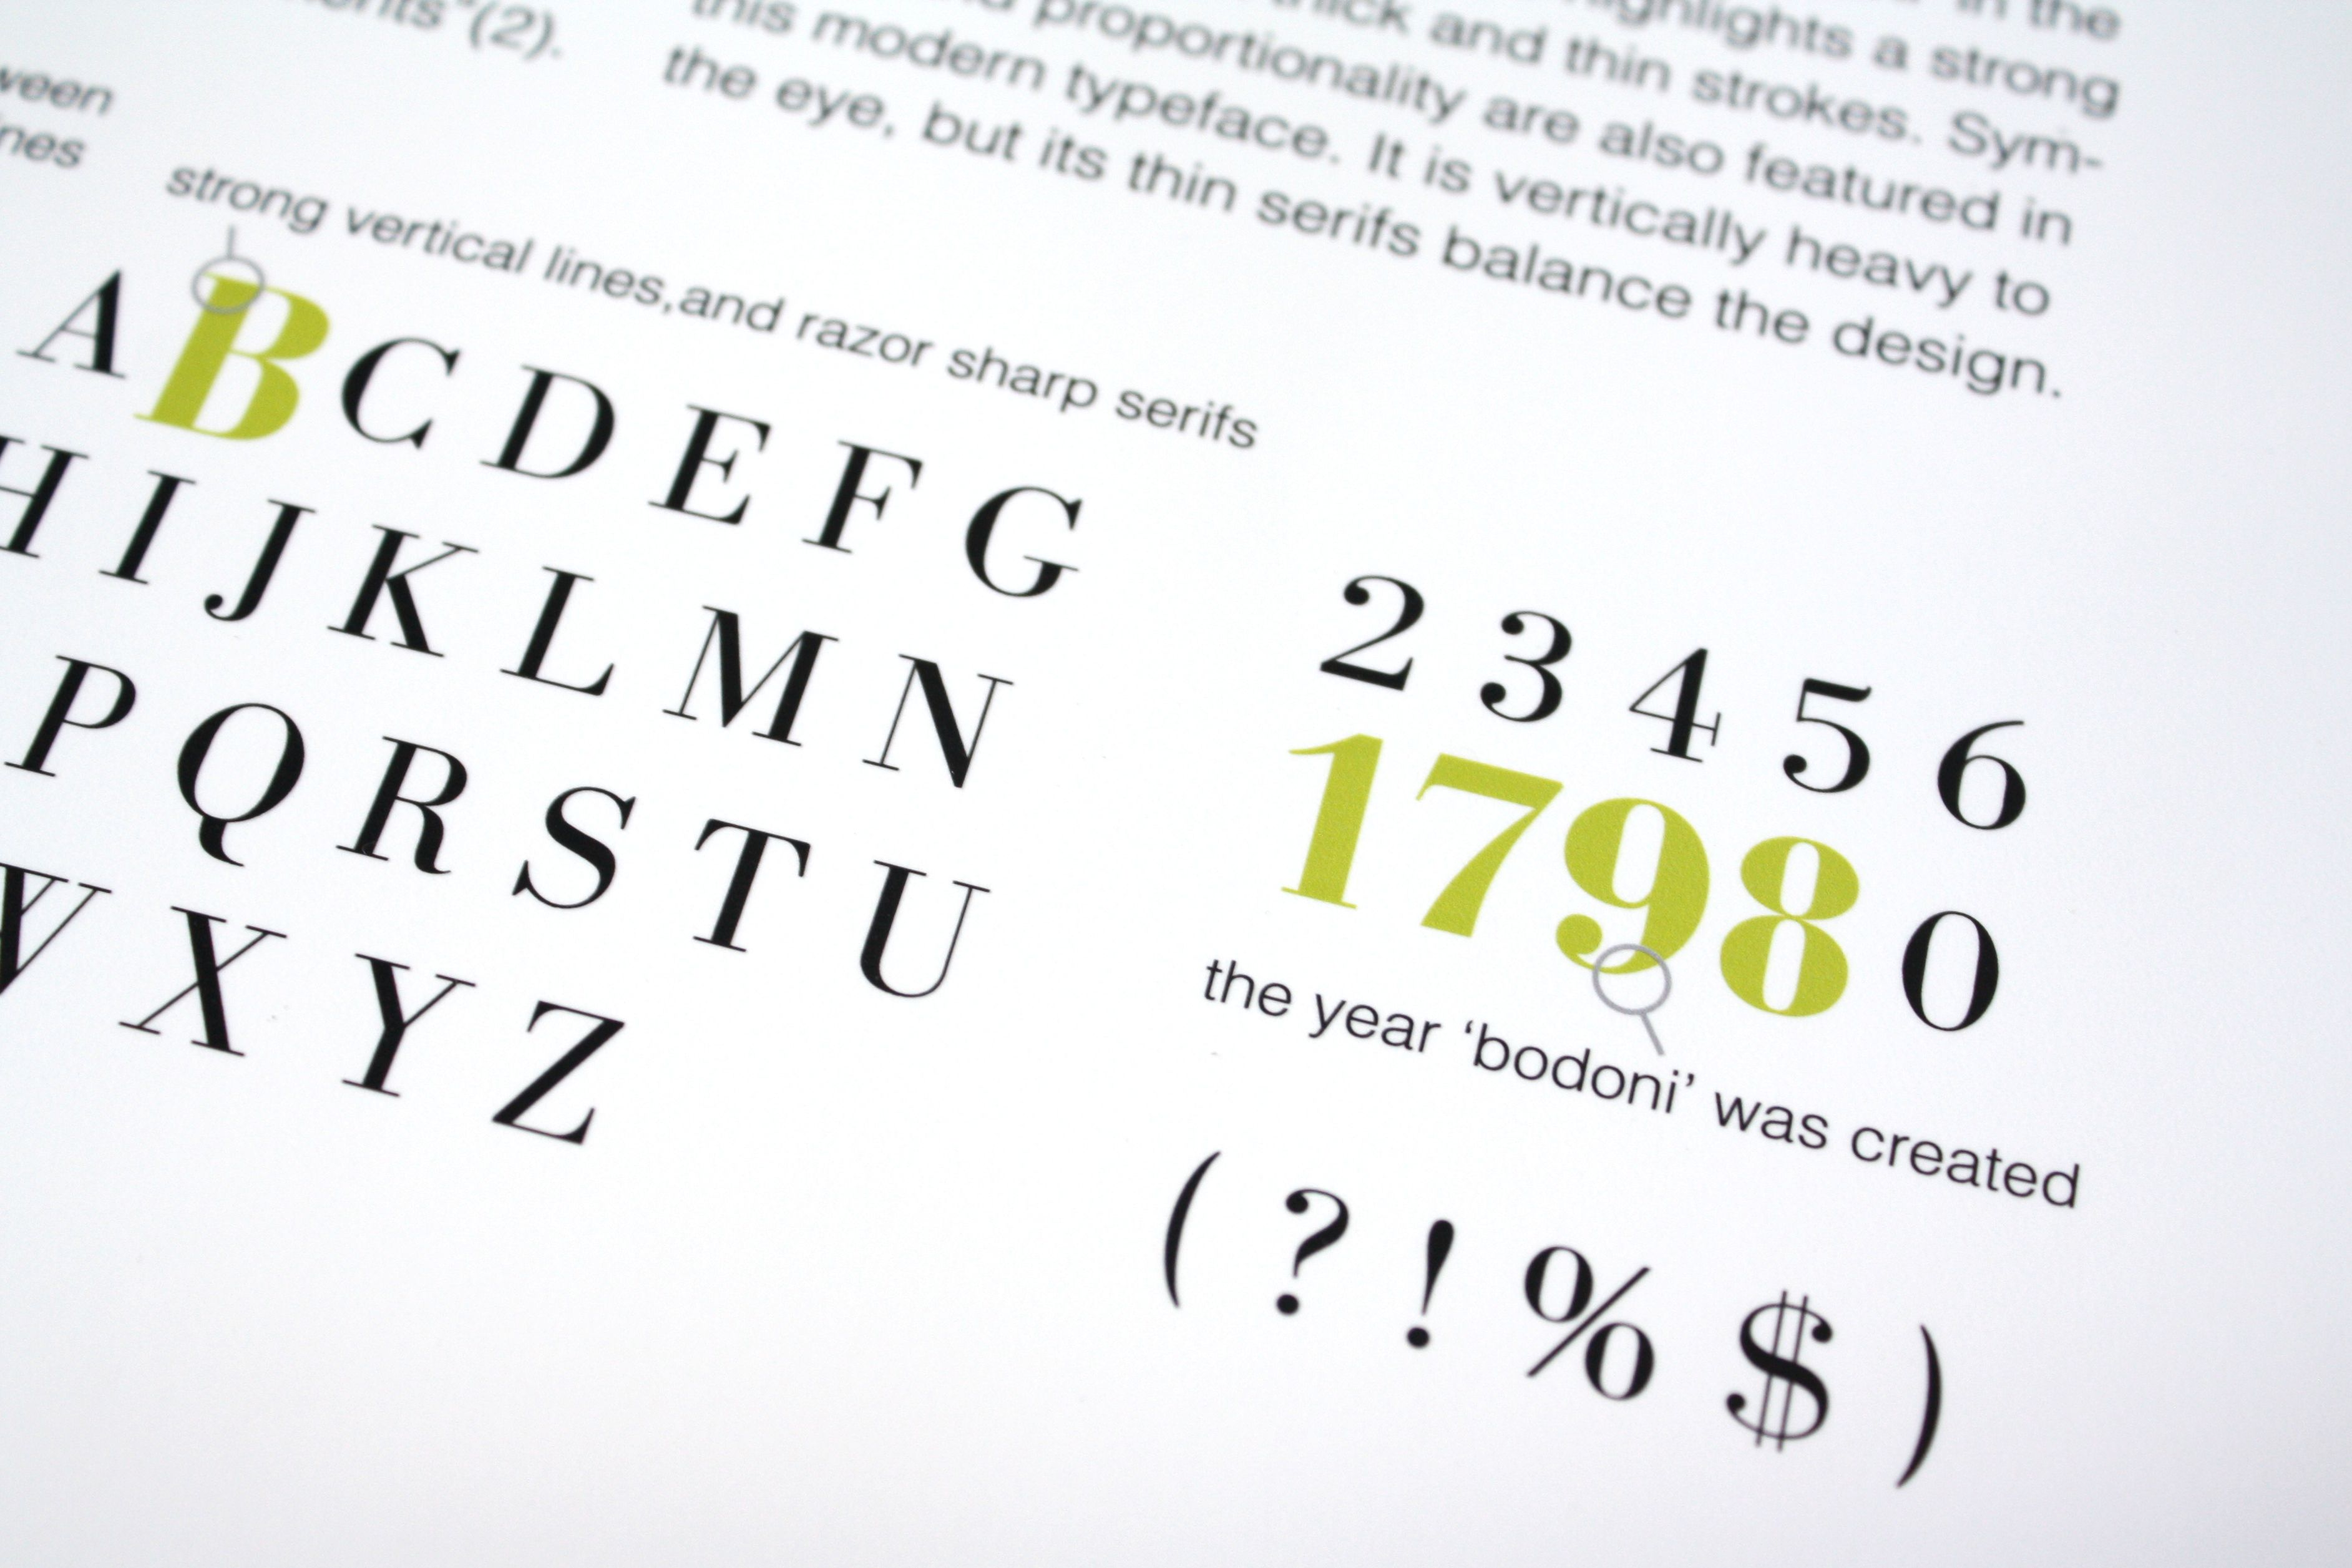 A poster highlighting the famous typographer Giambattista Bodoni.